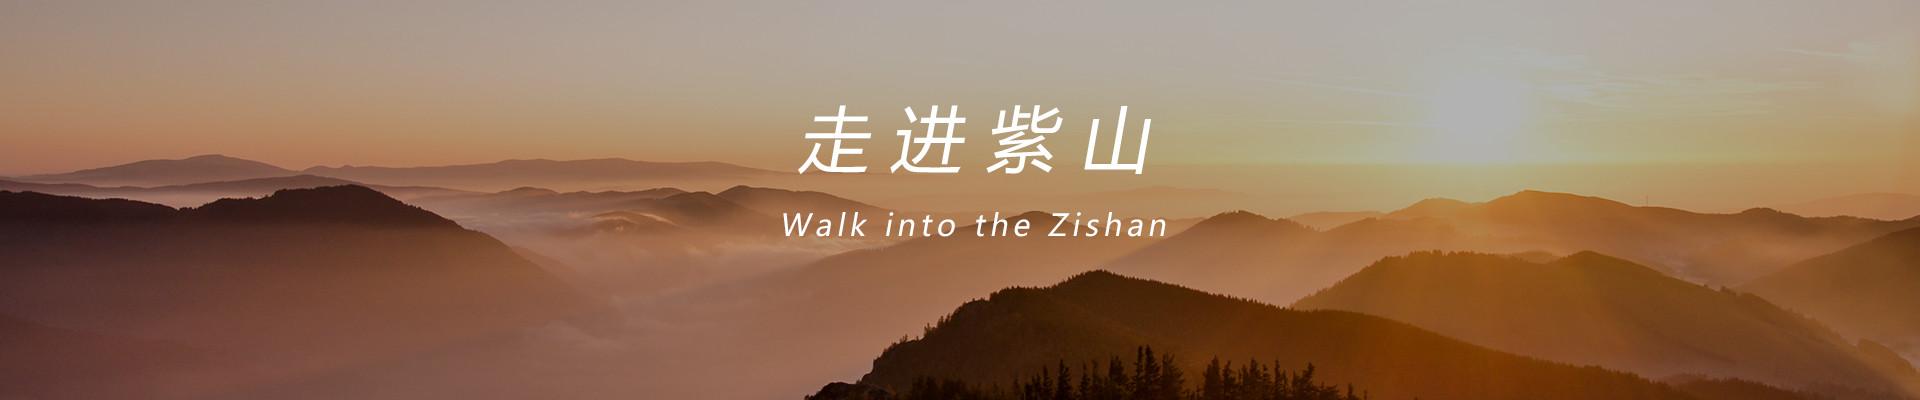 Enter Zishan